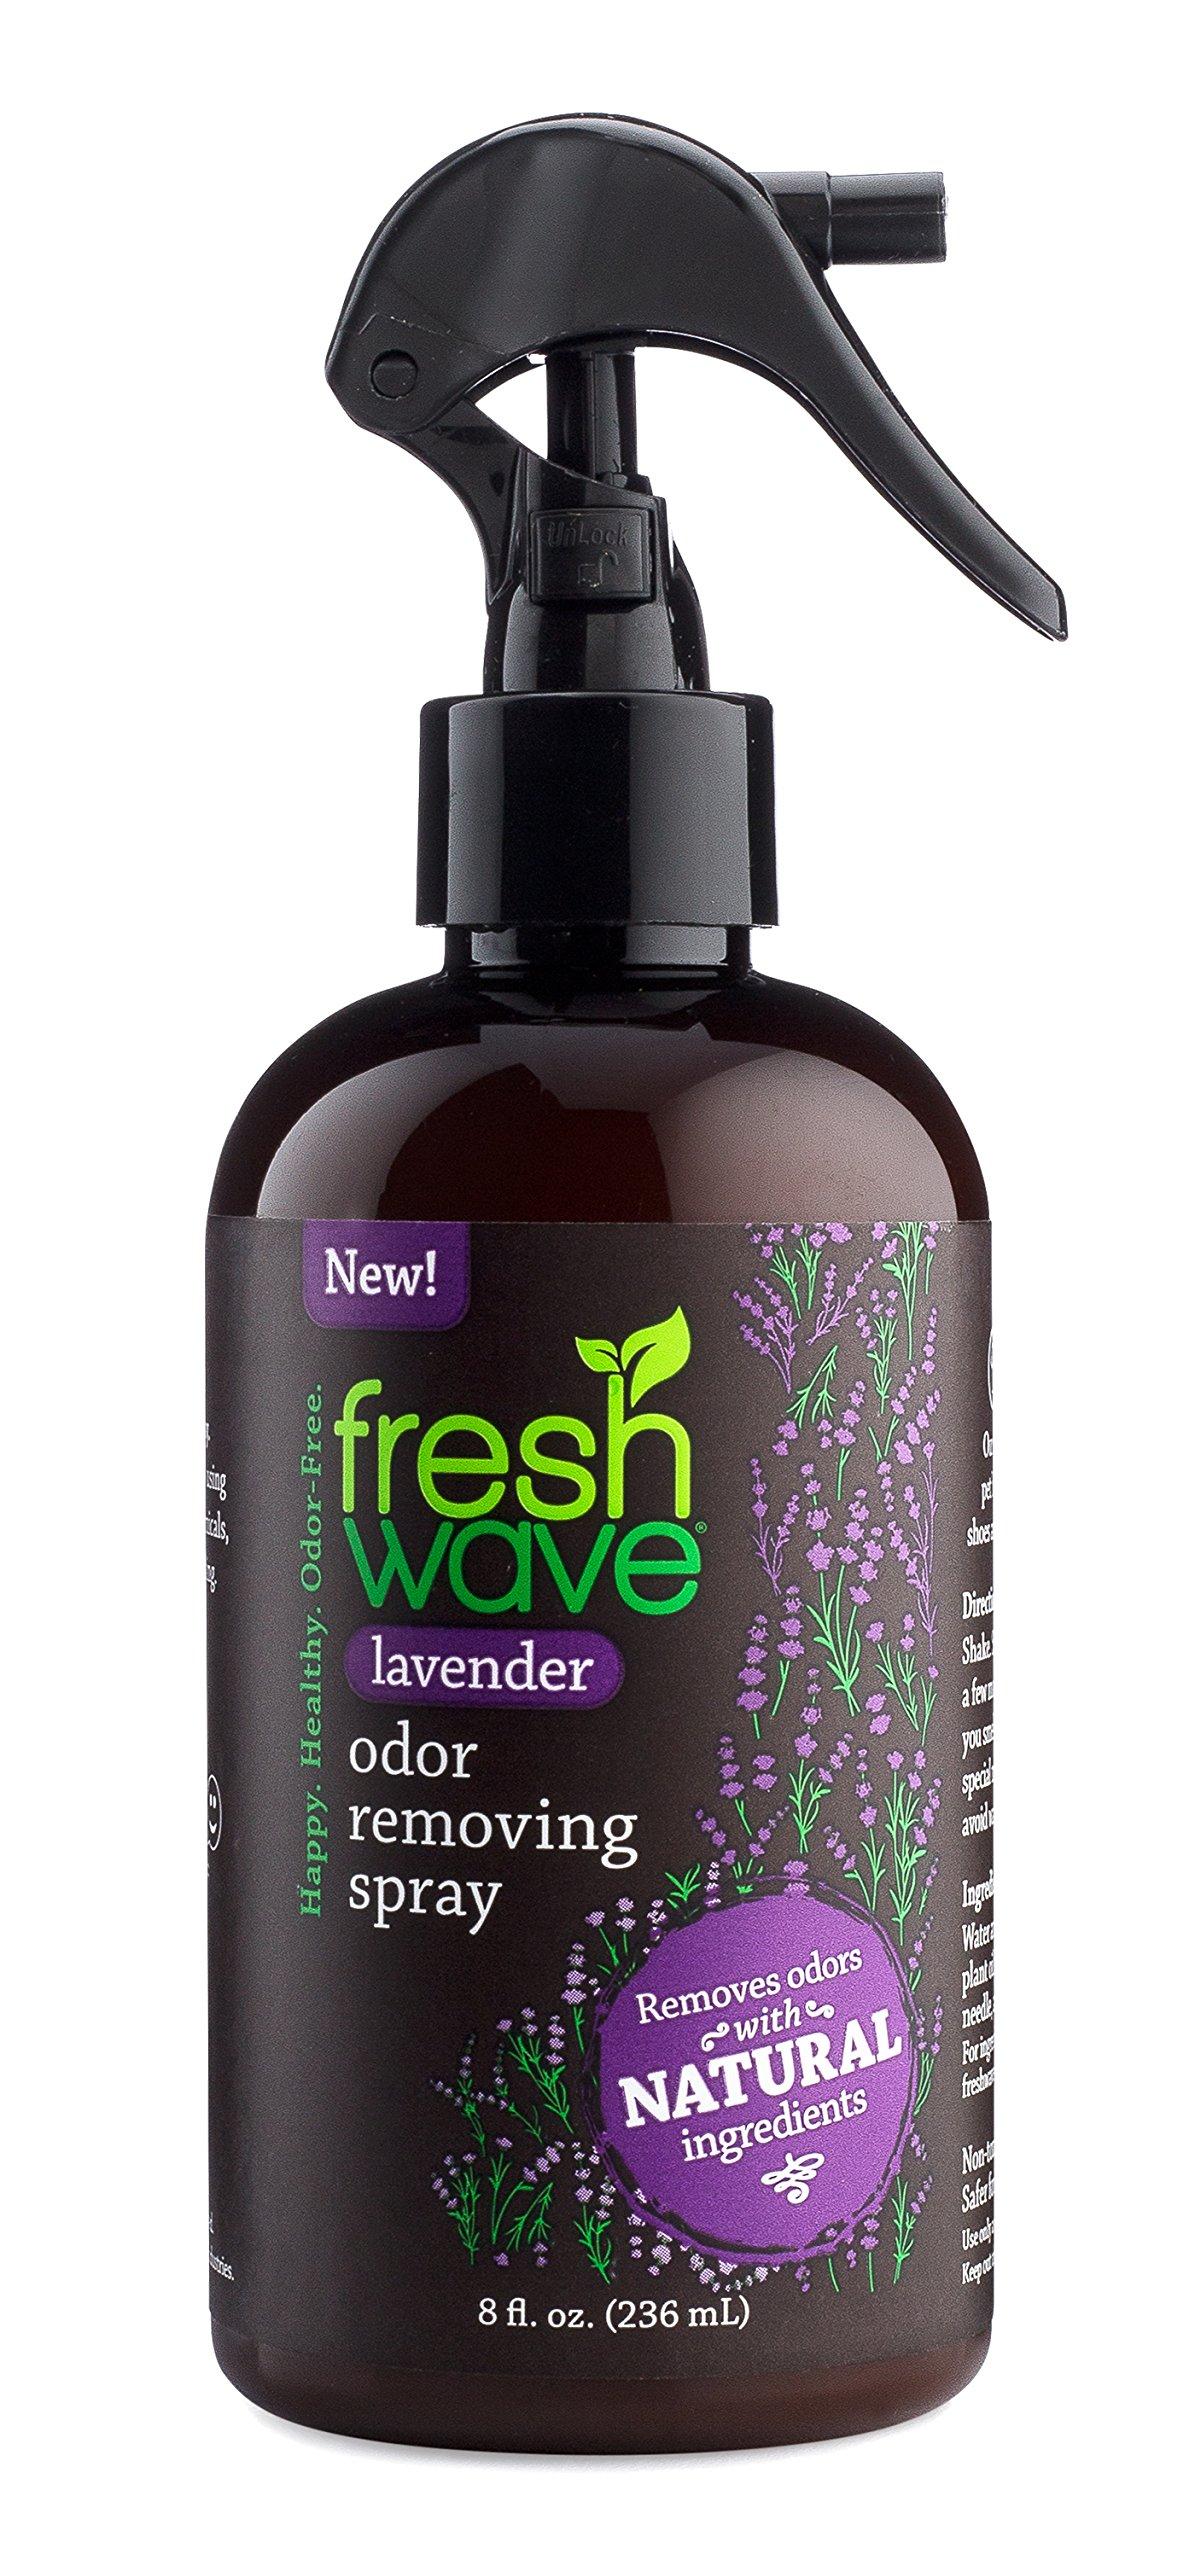 Fresh Wave Lavender Odor Removing Spray, 8 fl. oz.